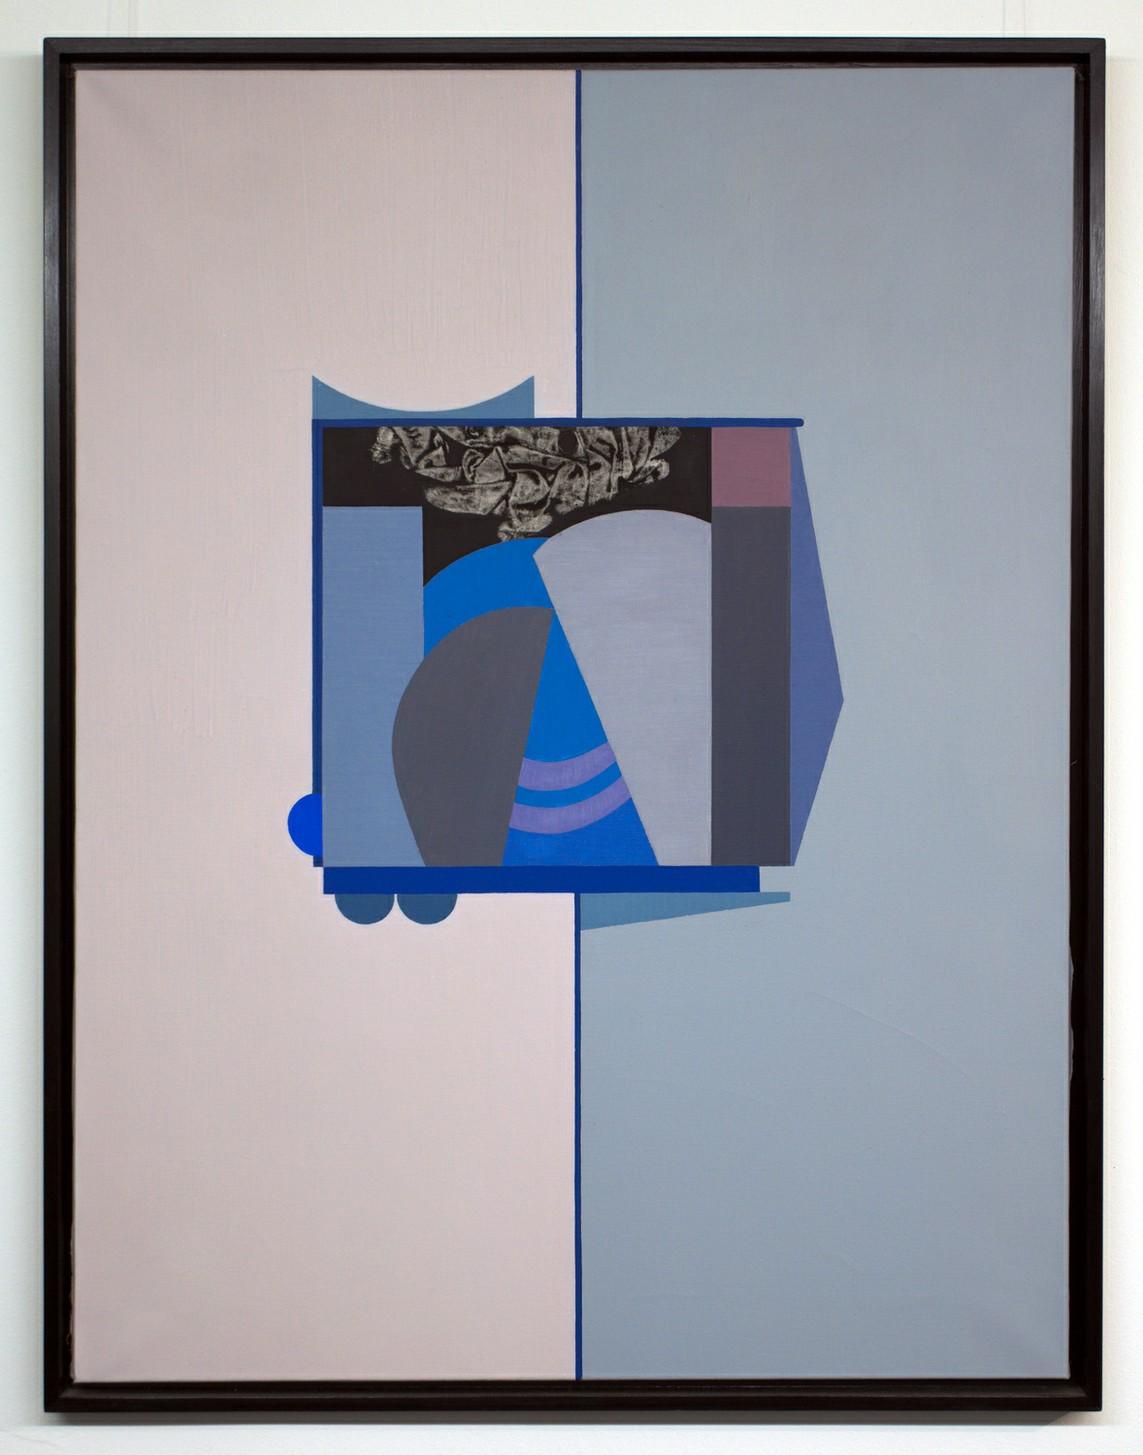 »HAUS V.« Öl auf Leinwand, 116,5 x 89,5 cm, 1967